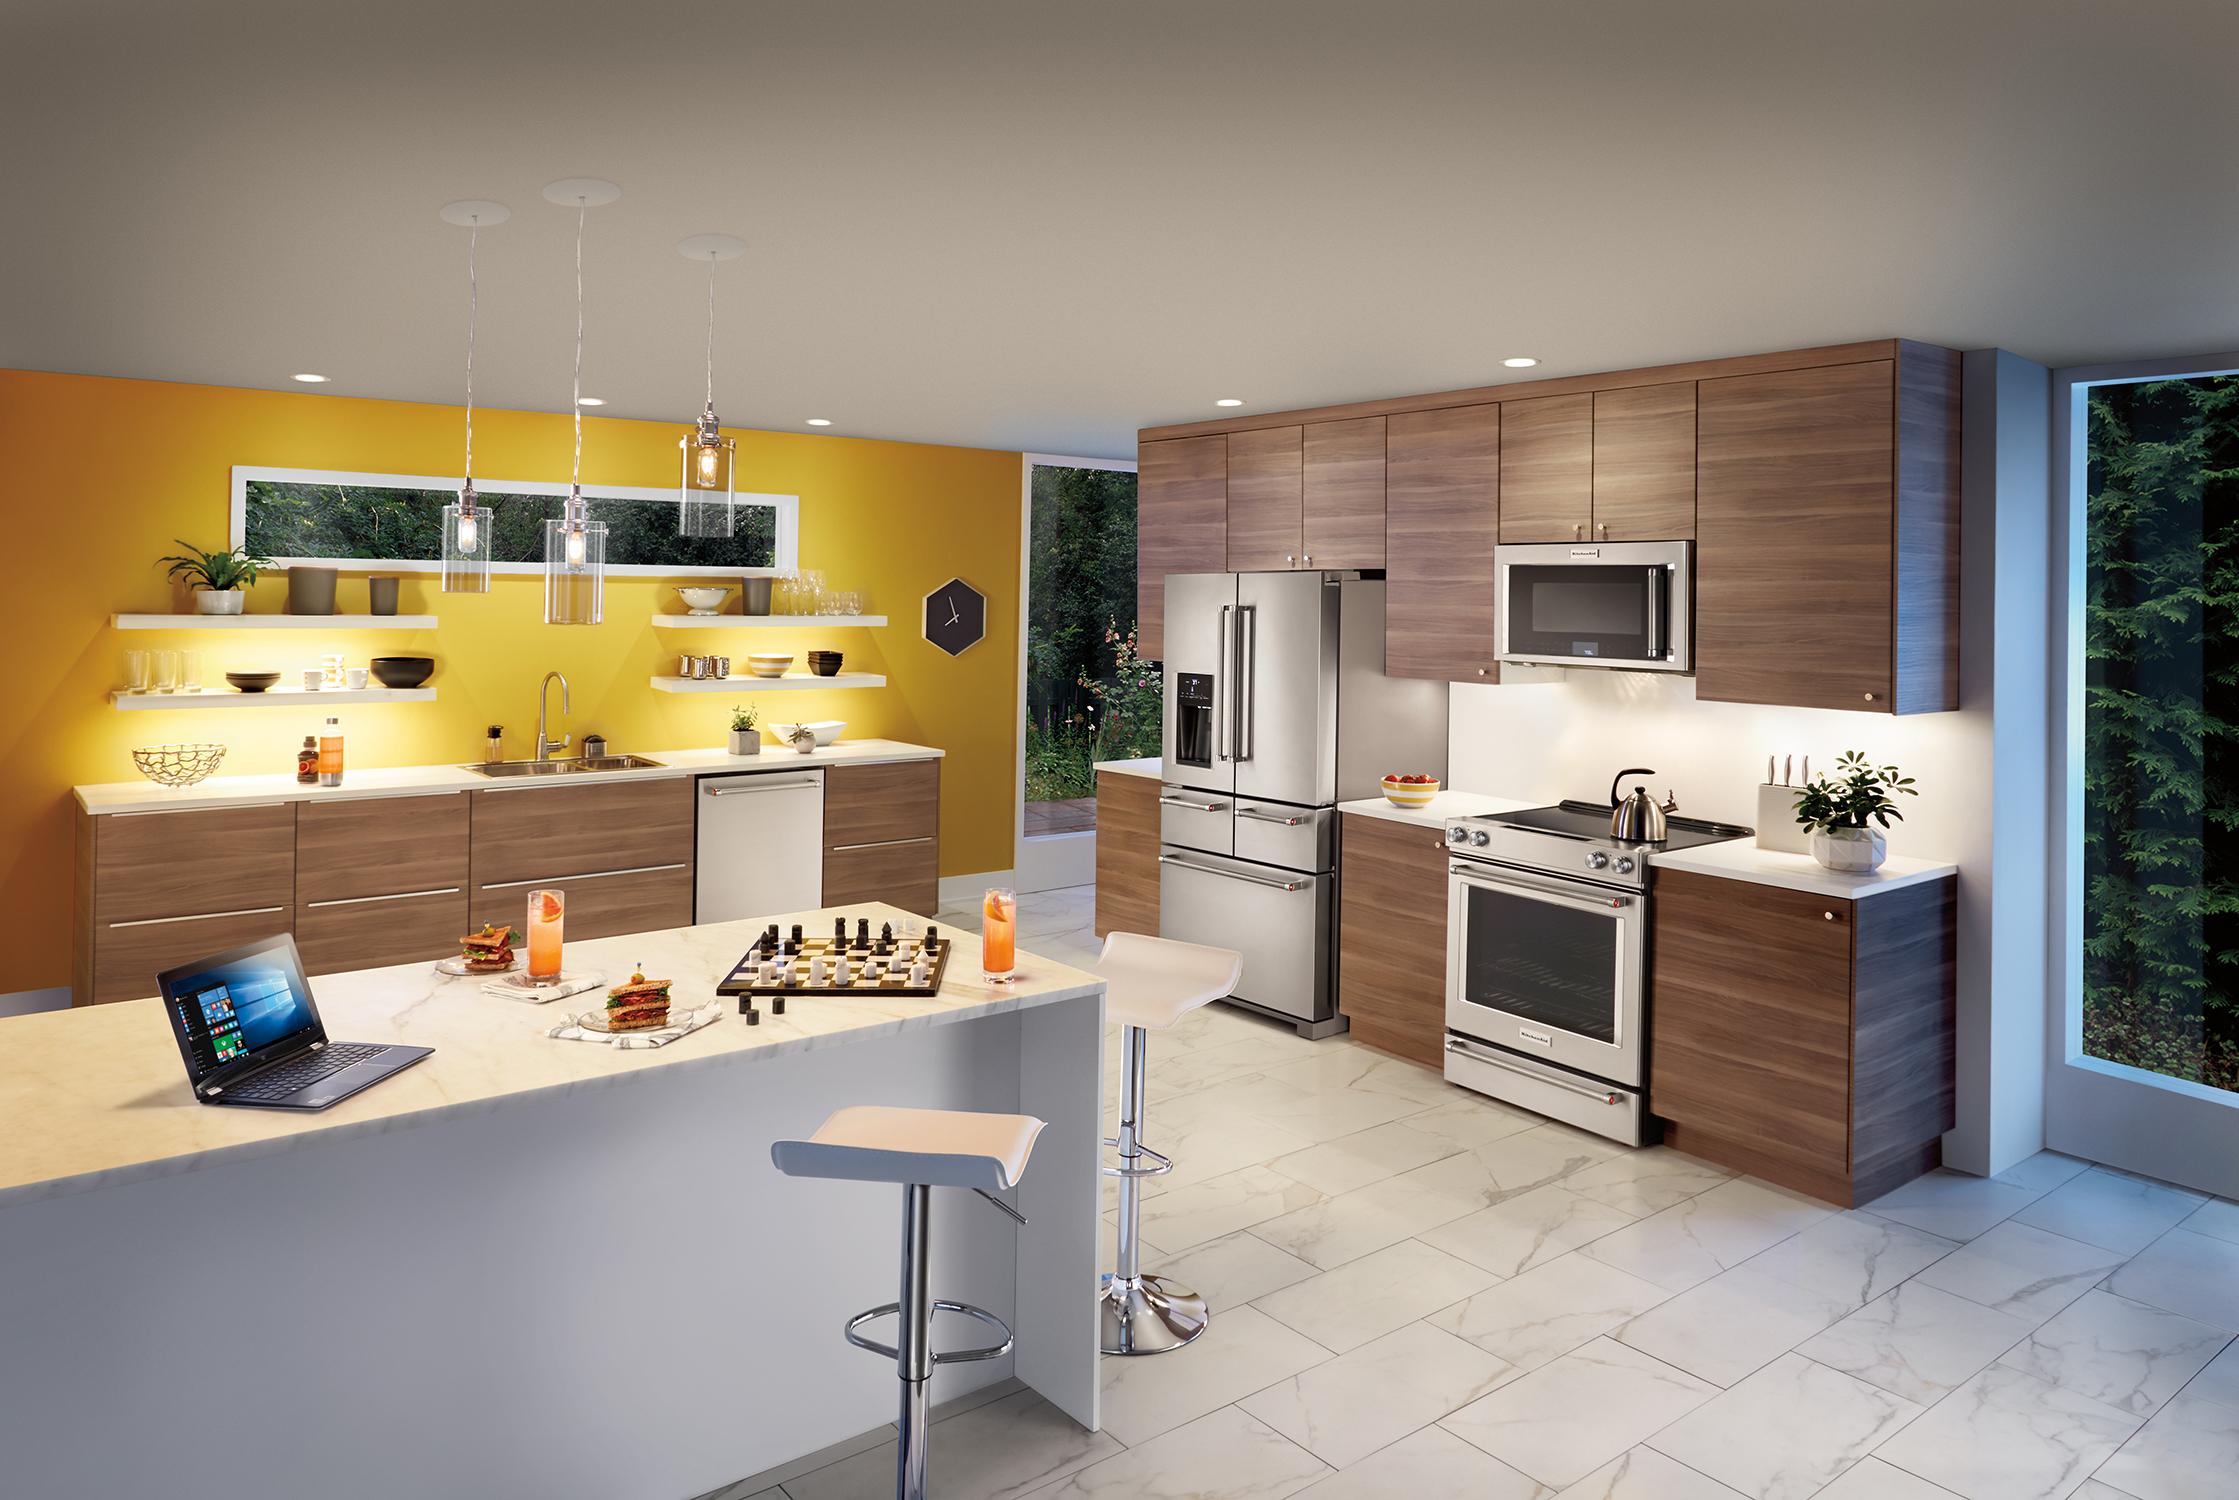 Uncategorized Kitchenaid Kitchen Appliances my wish list includes new kitchenaid appliances